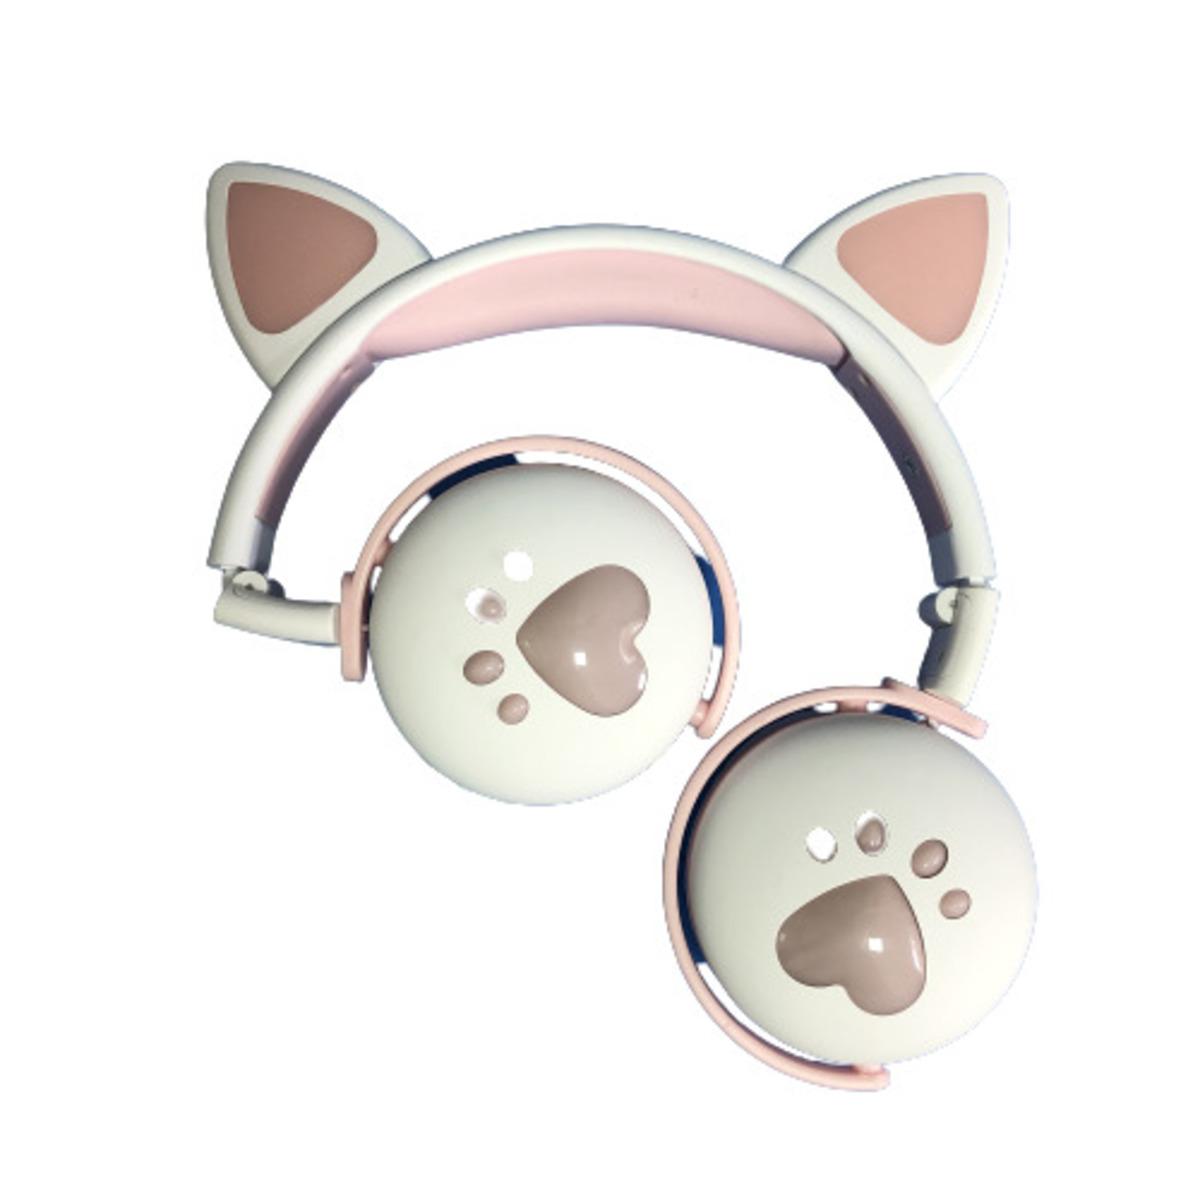 Fone De Ouvido Bluetooth Led Orelha Gato Infantil Headphone Branco